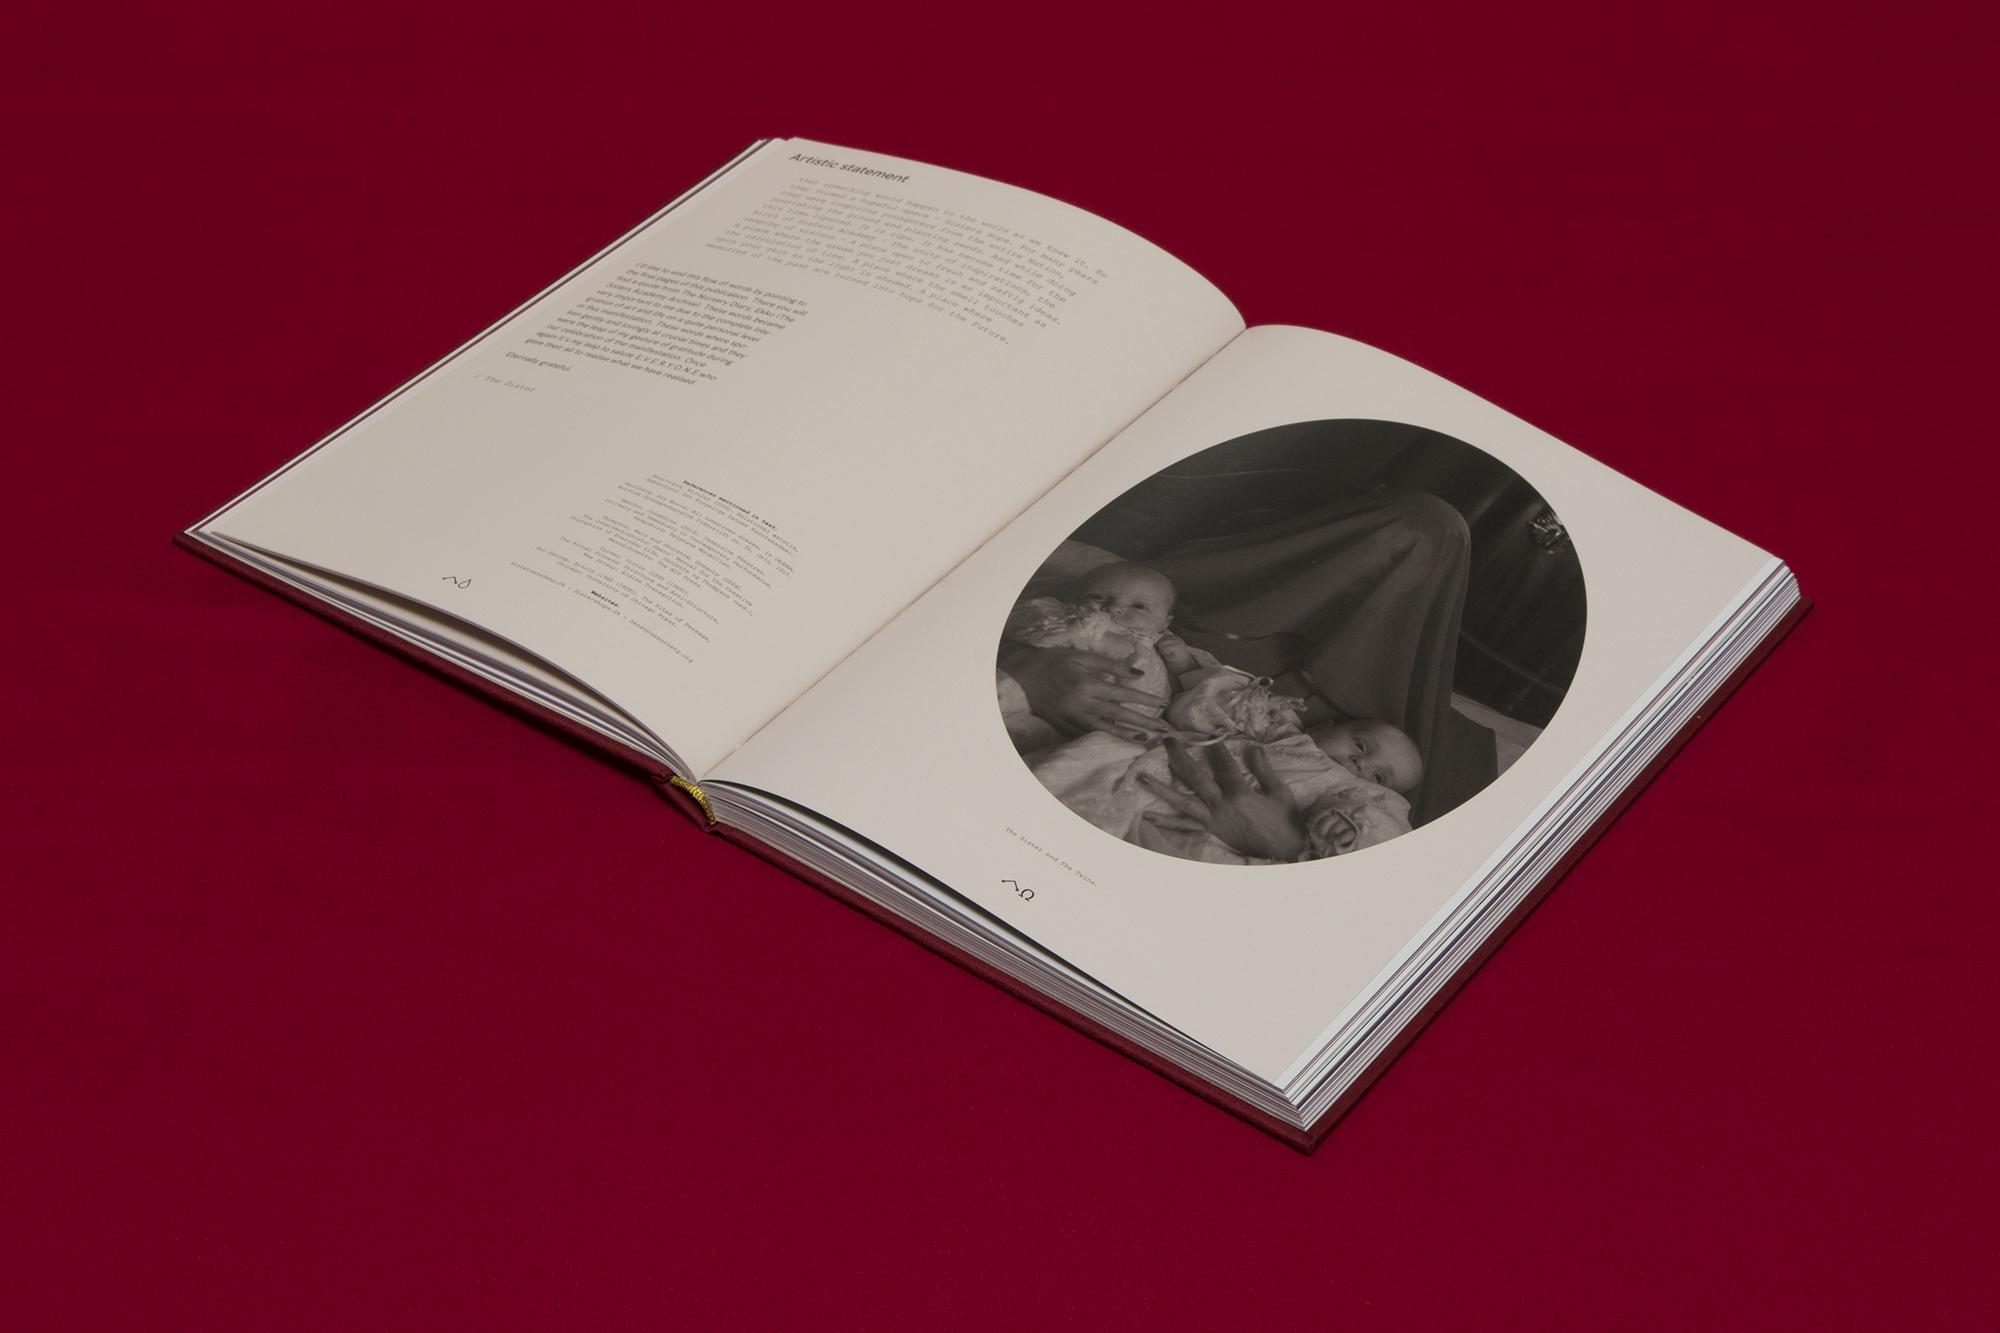 SistersAcademyBook-Agency.idoart.dk-120-2000.jpg